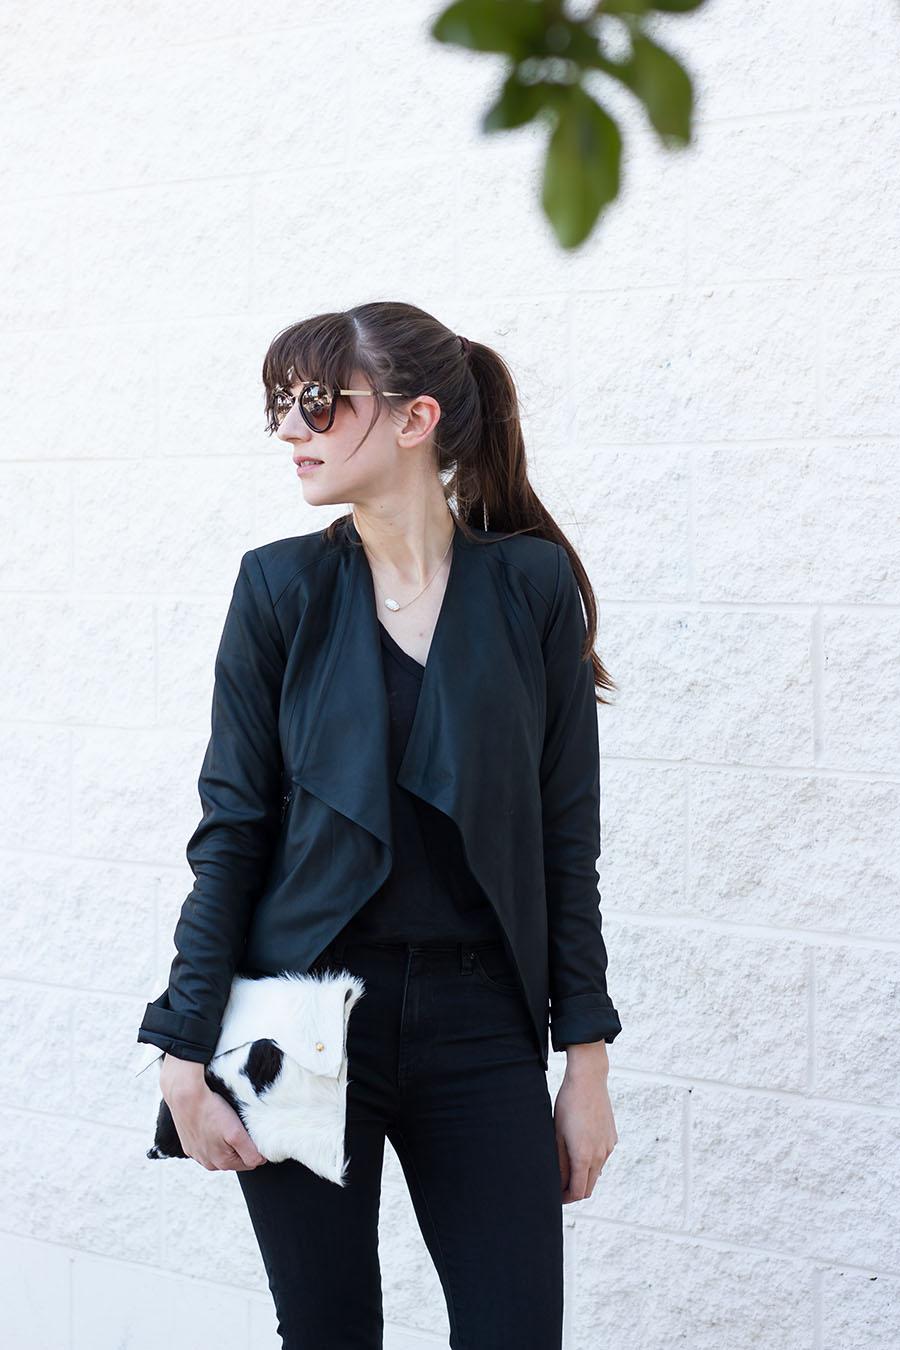 Black Leather Jacket, Cowhide Clutch, Prada Sunglasses